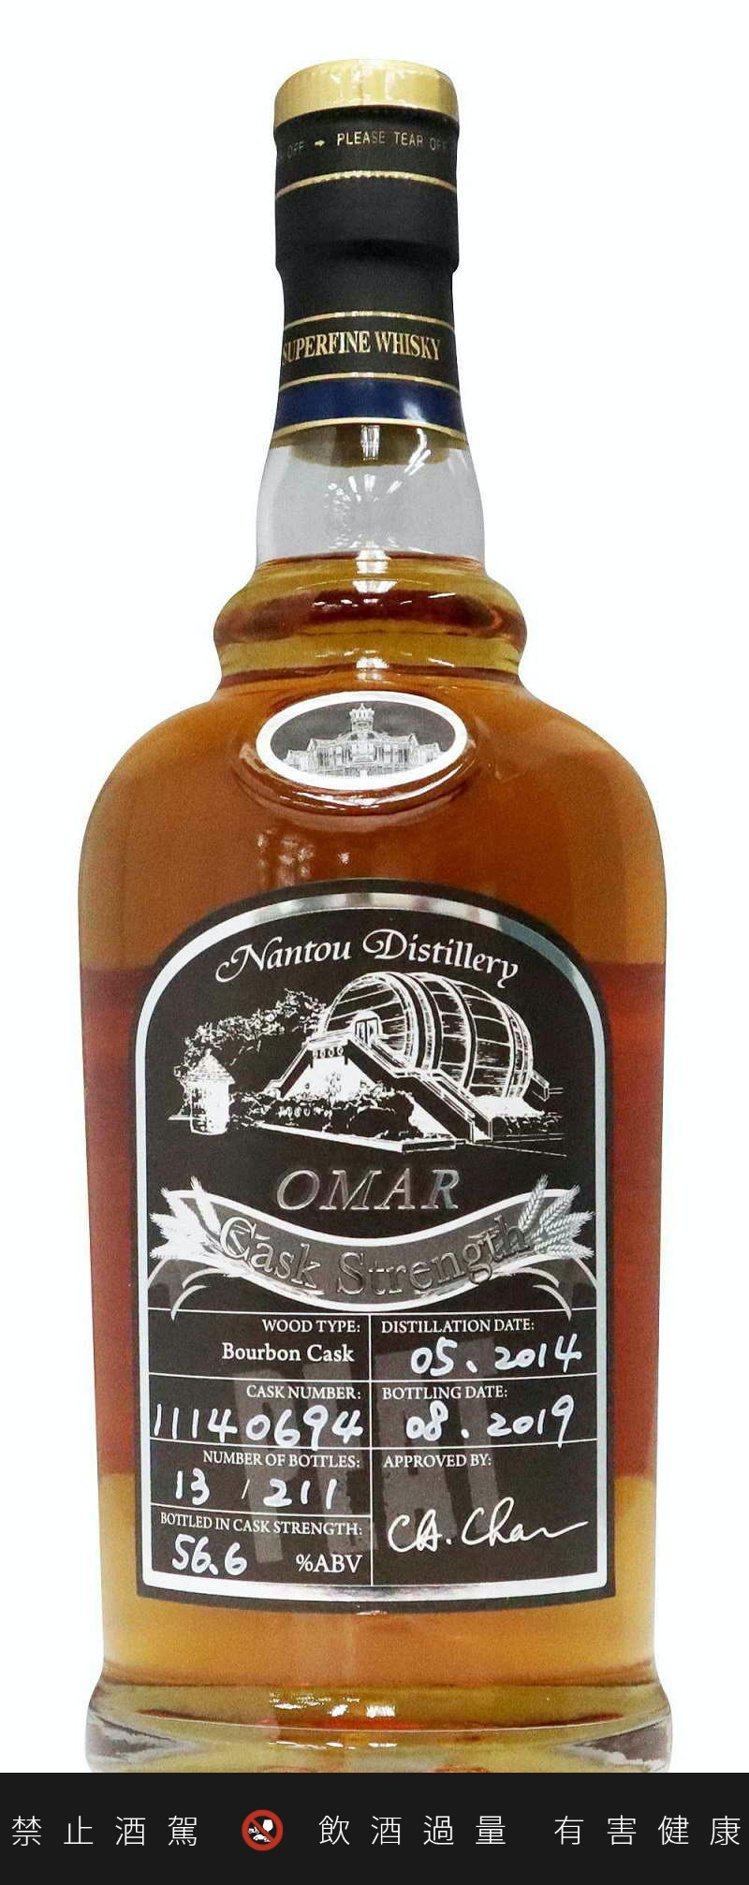 「OMAR原桶強度泥煤麥芽威士忌(波本桶)」獲麥芽狂人大賽(非蘇格蘭區)最佳泥煤...